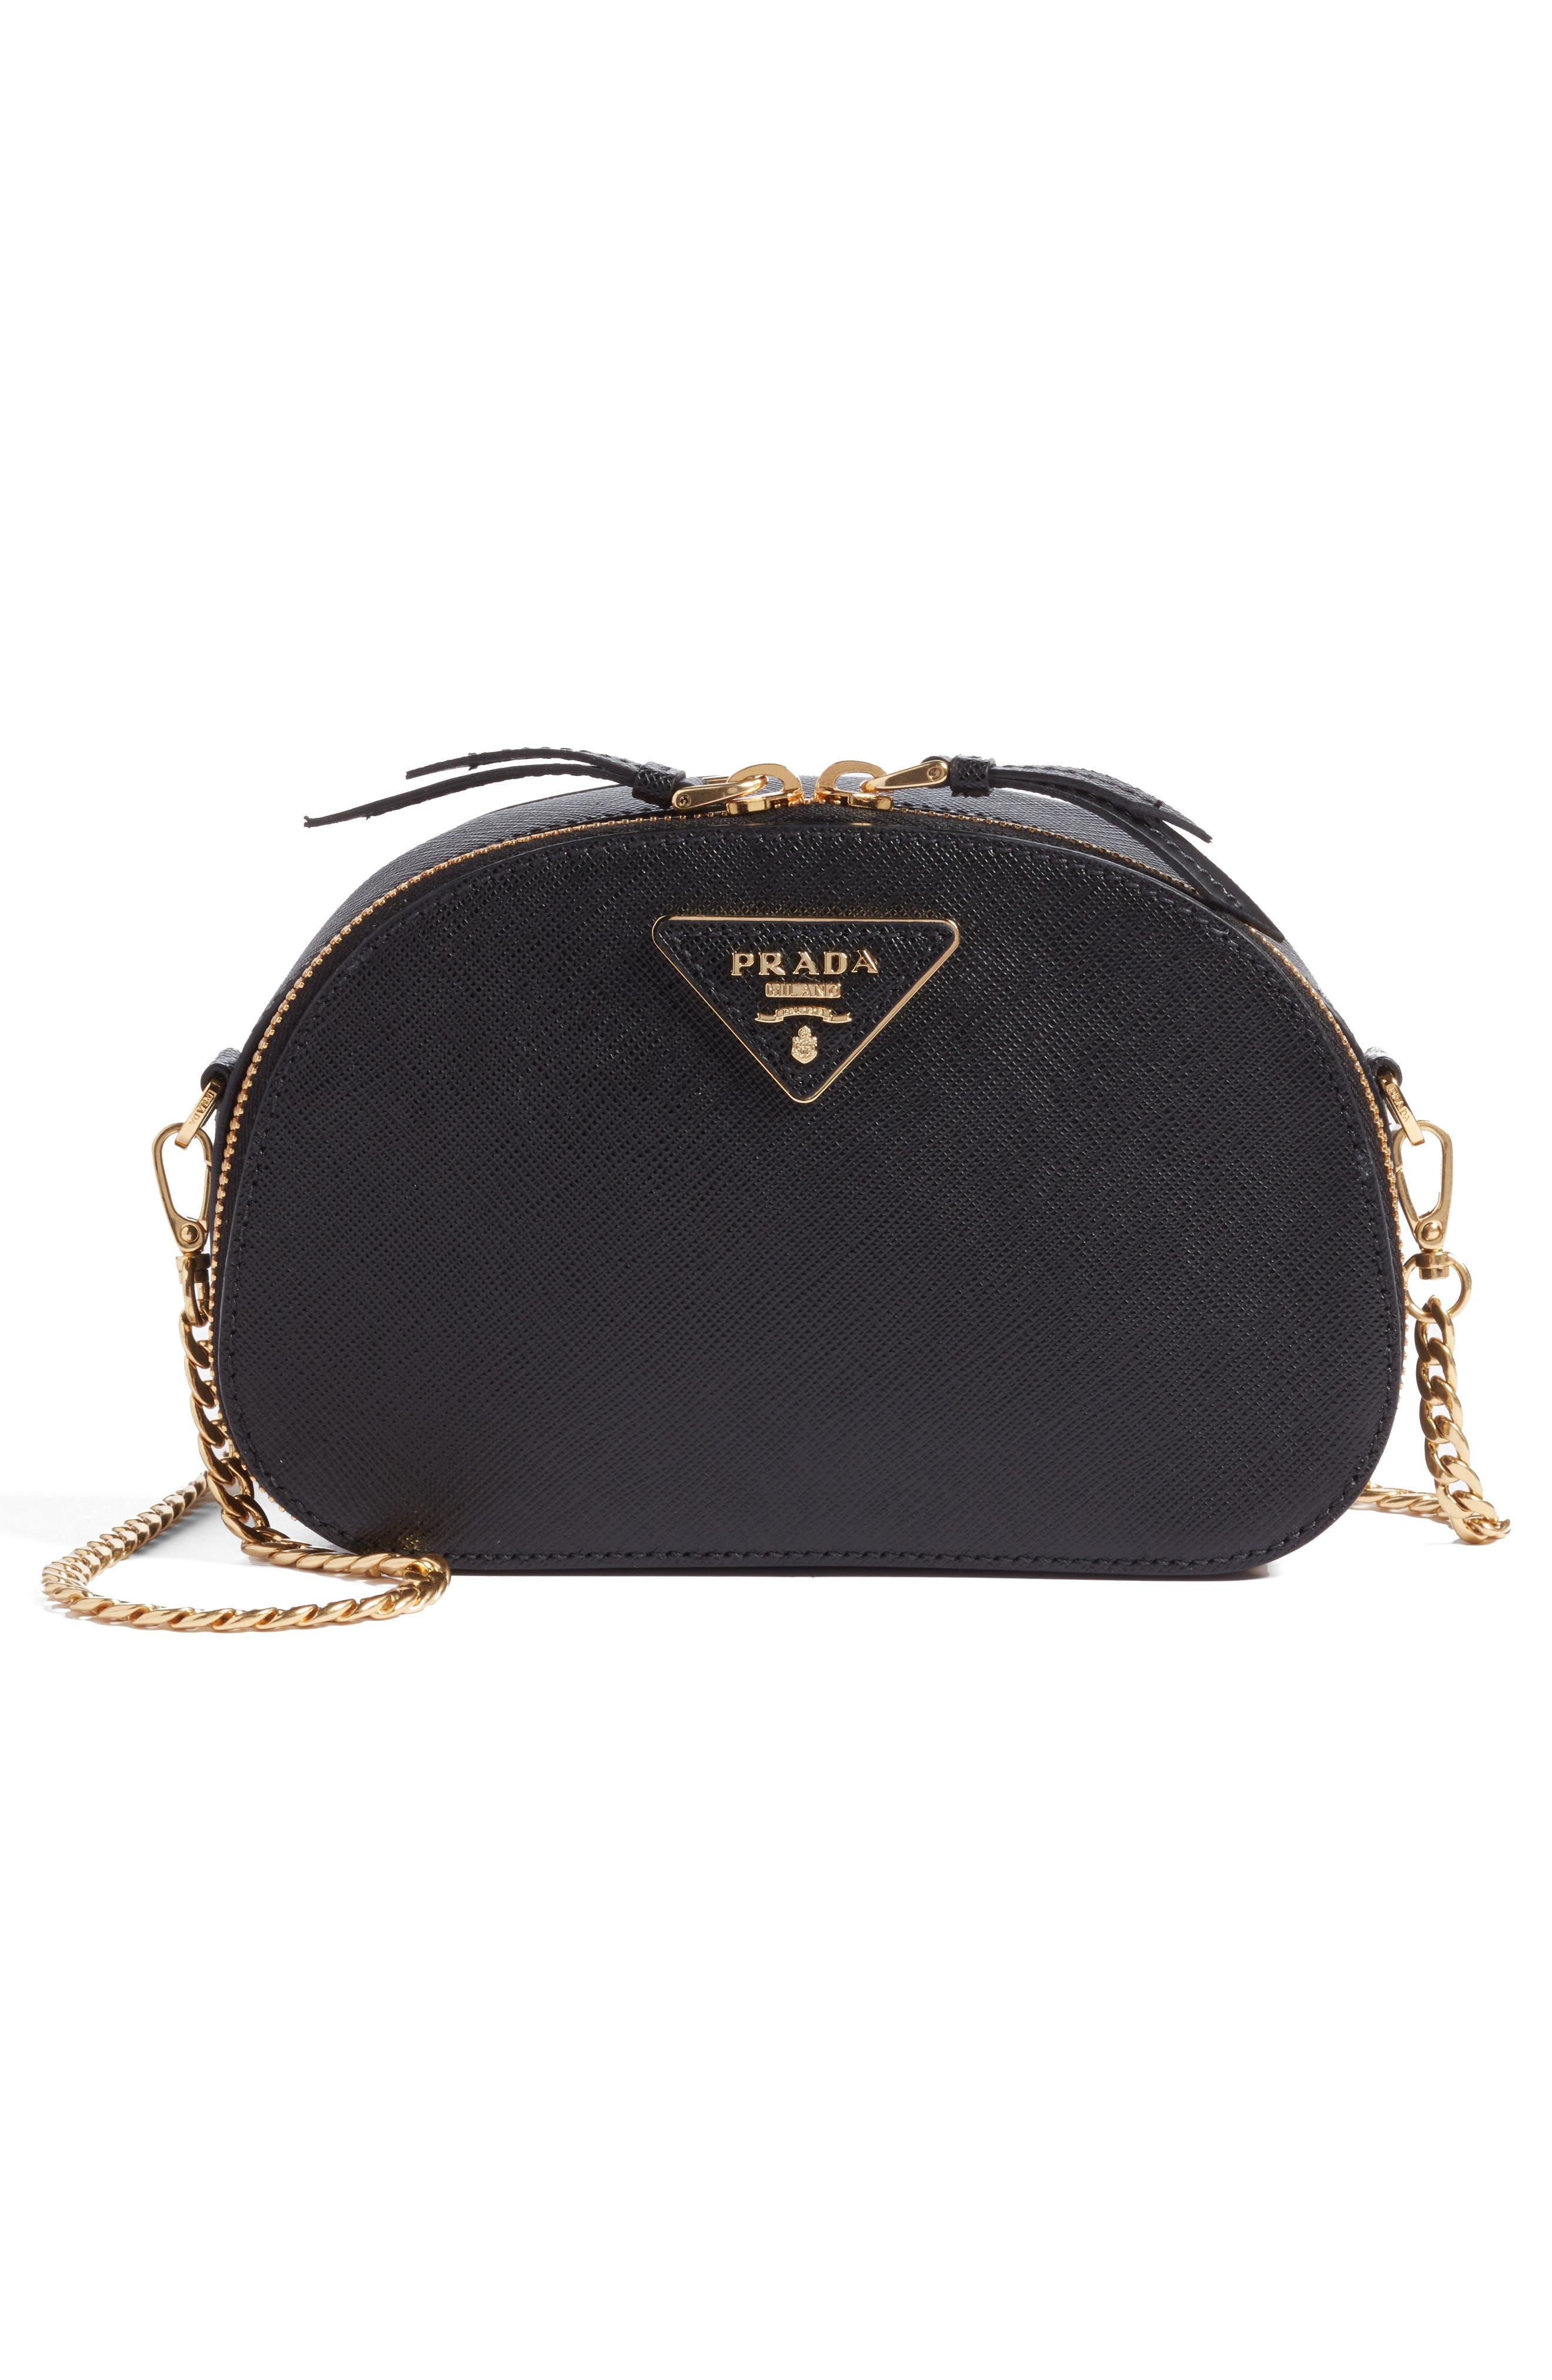 PRADA, Saffiano Leather Belt Bag, Alternate thumbnail 8, color, 001